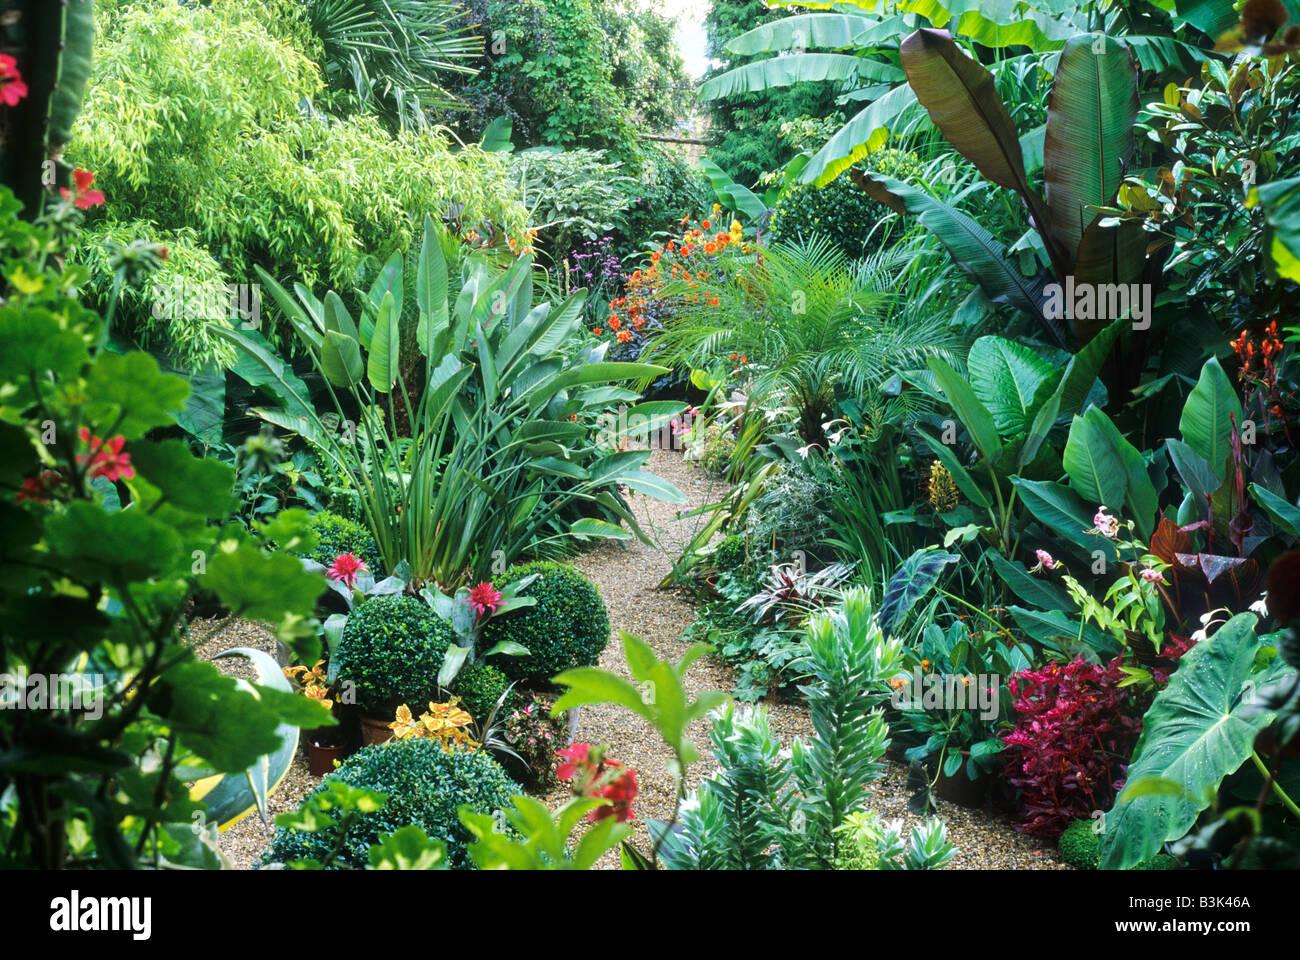 Beautiful Uk Tropical Plants Part - 12: Exotic Planting Tropical Style Garden Banana Plant England UK Musa Plants  Flowers